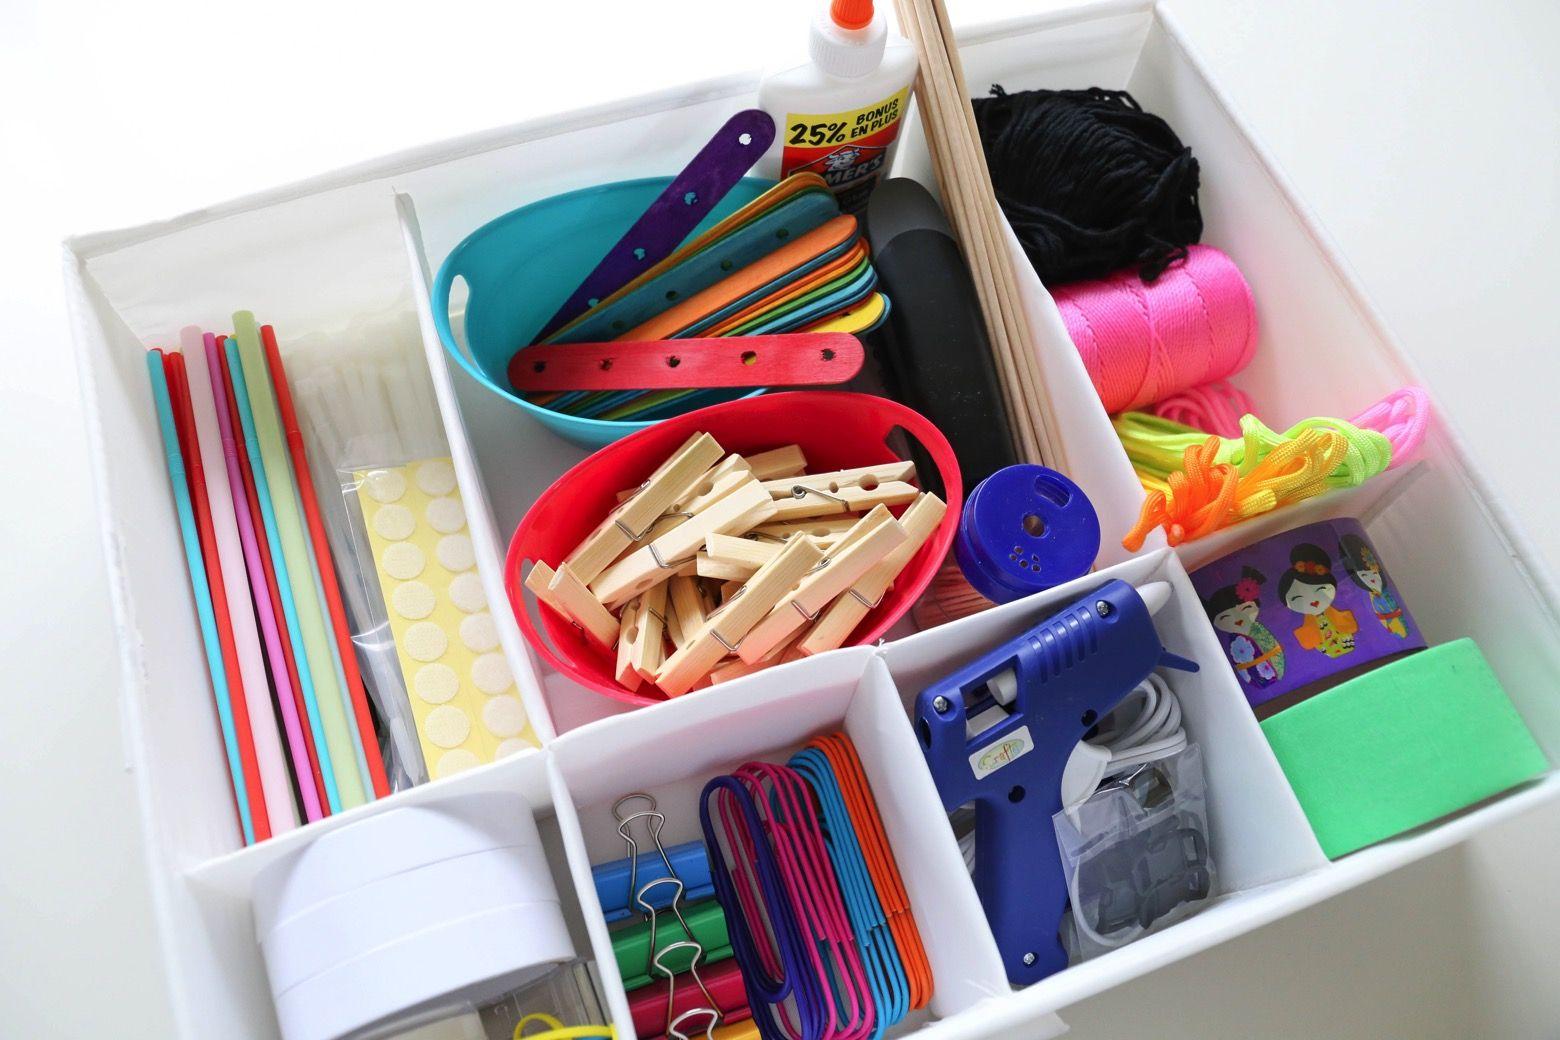 Inventing Kit For Kids